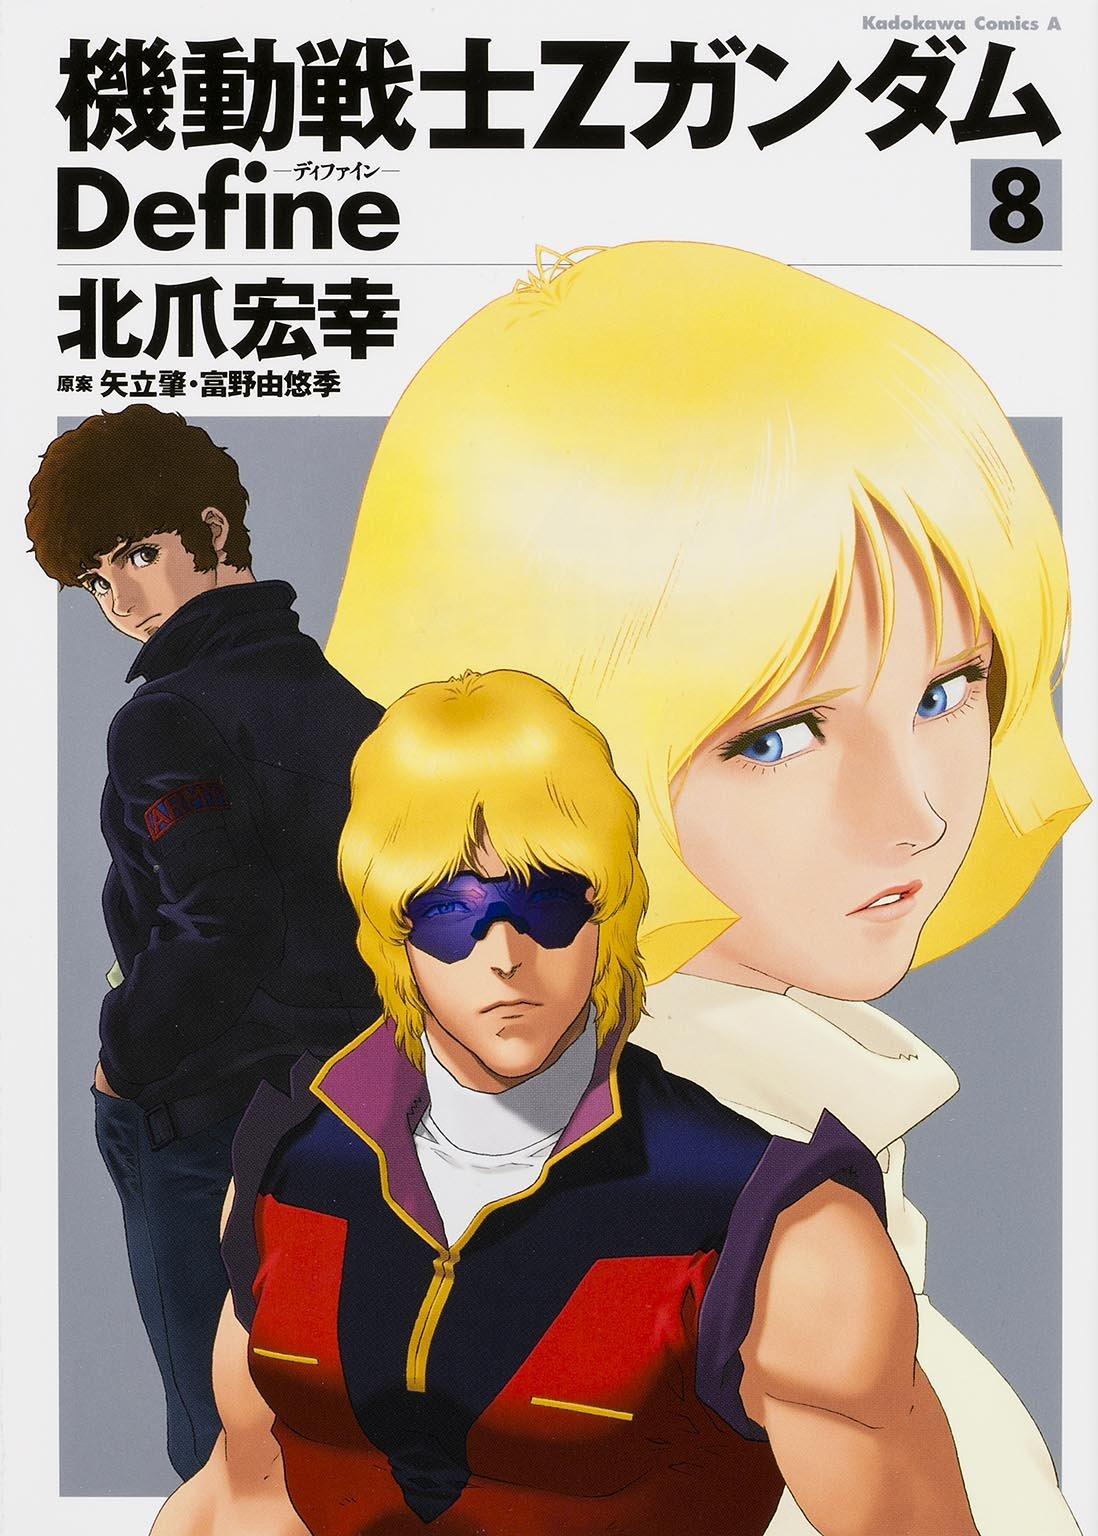 File:Mobile Suit Gundam Z Define Vol. 8.jpg.jpg